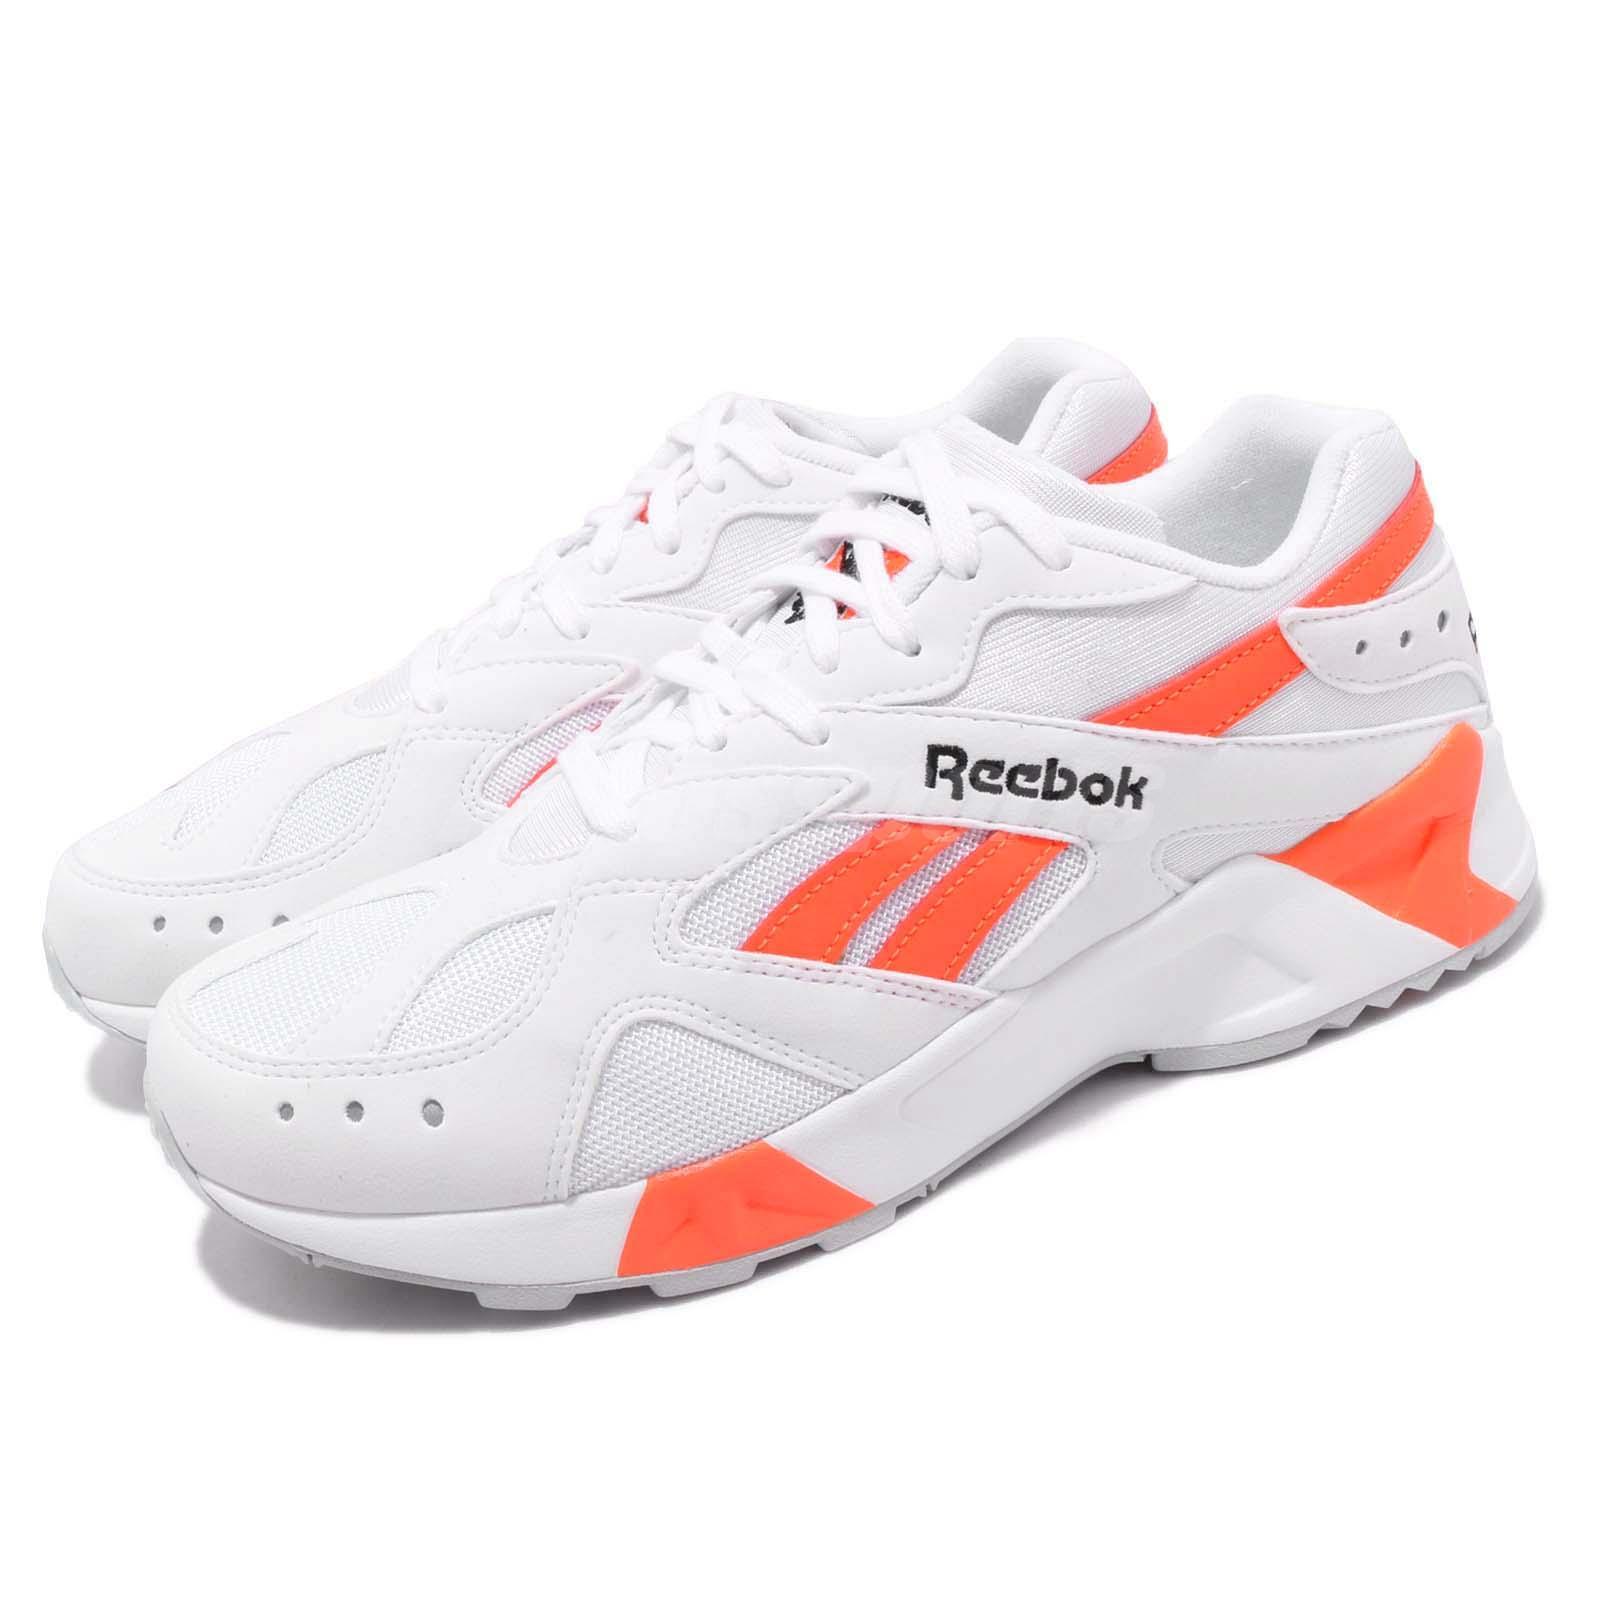 reebok shoes orange